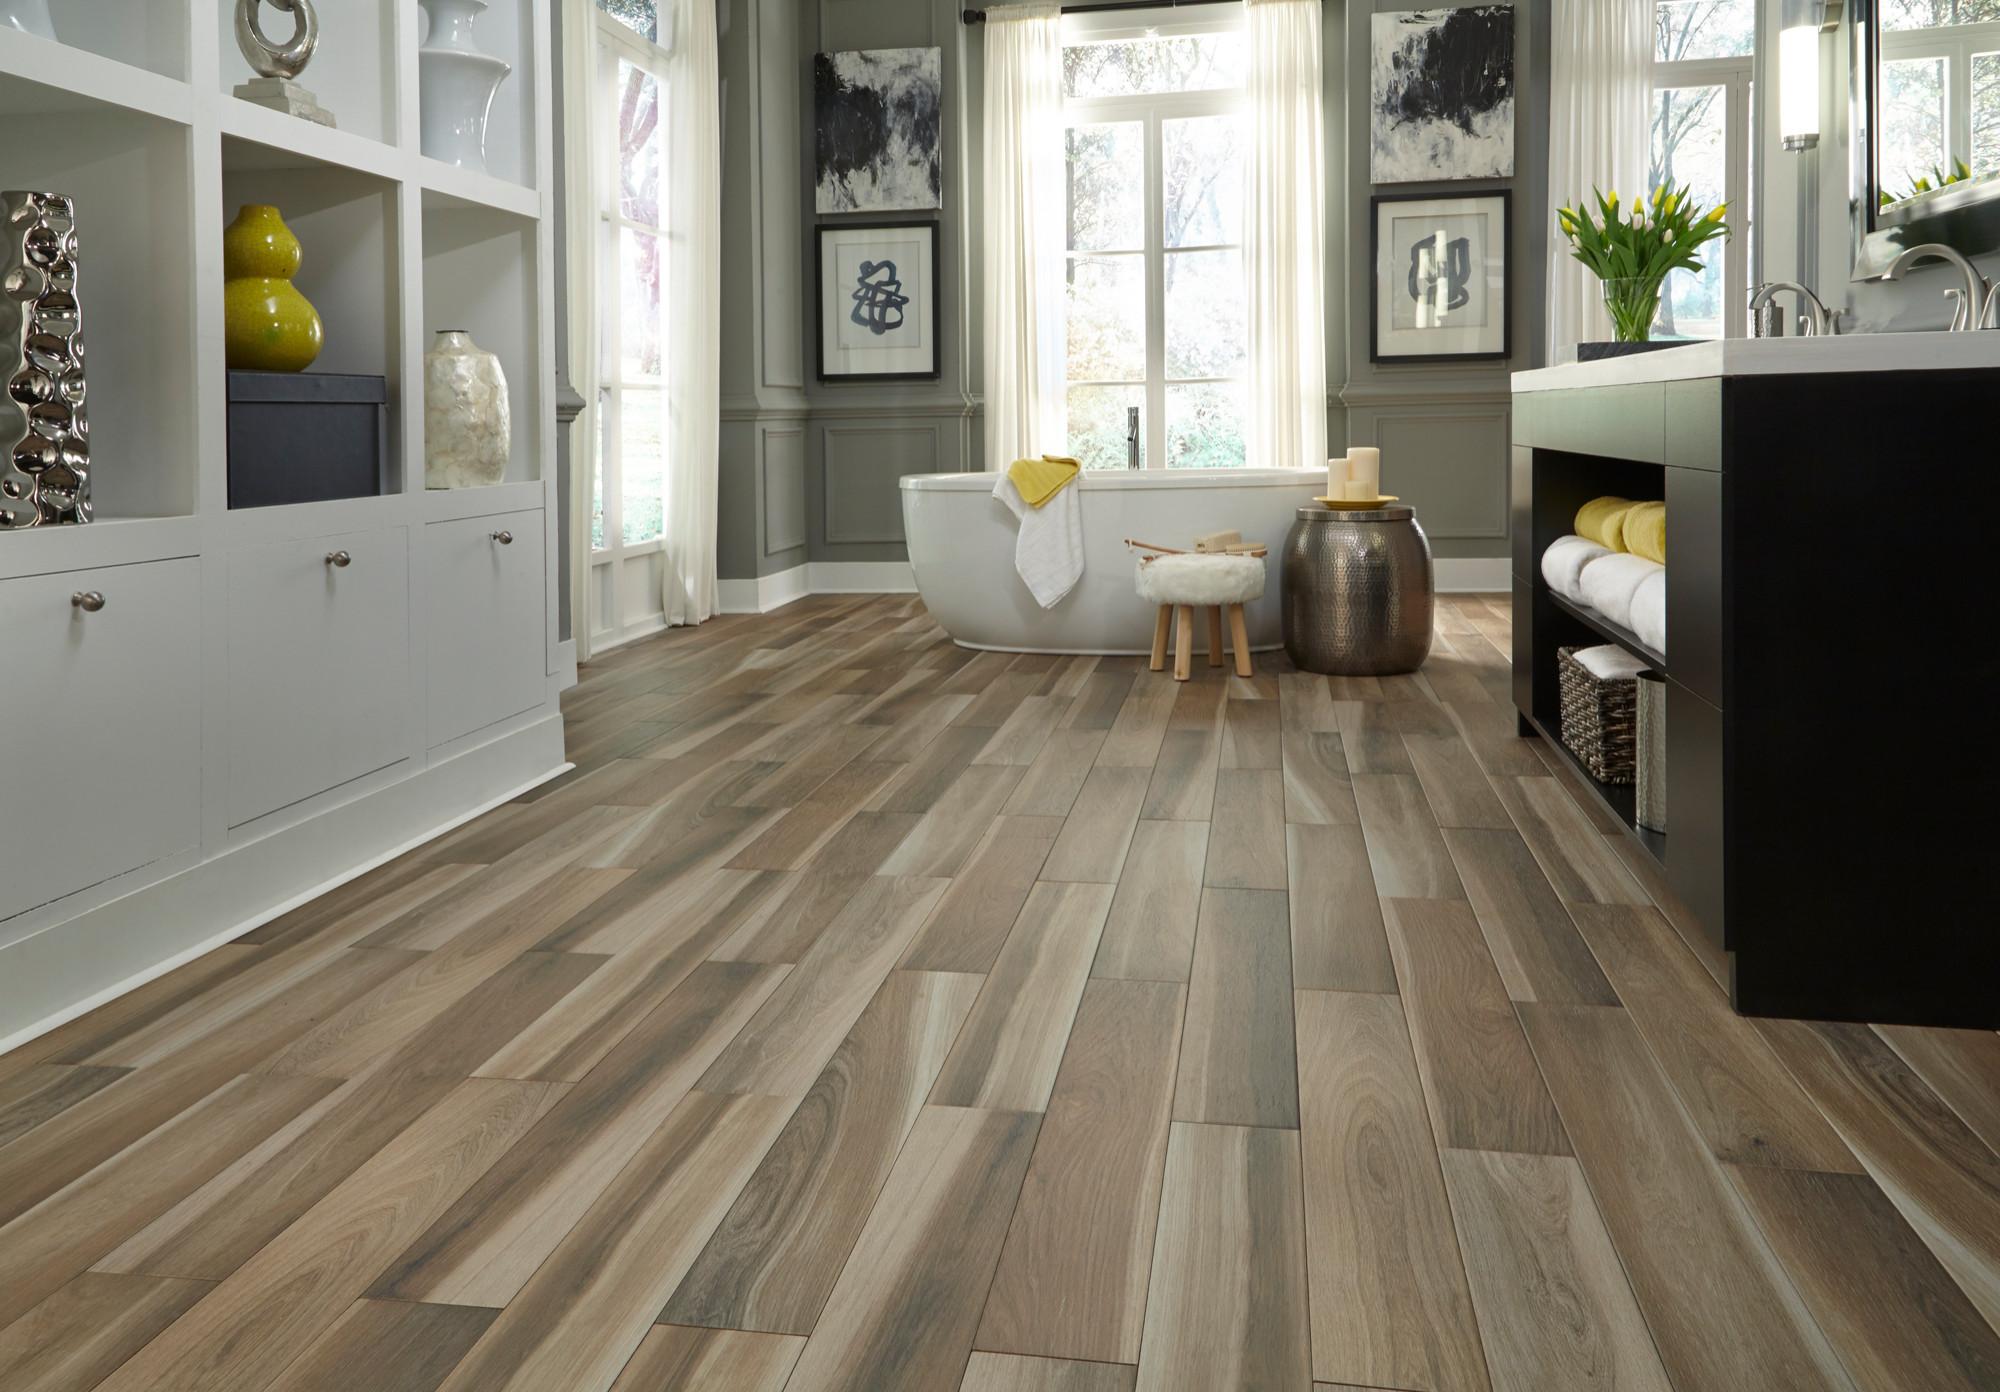 avella brindle wood natural wood look